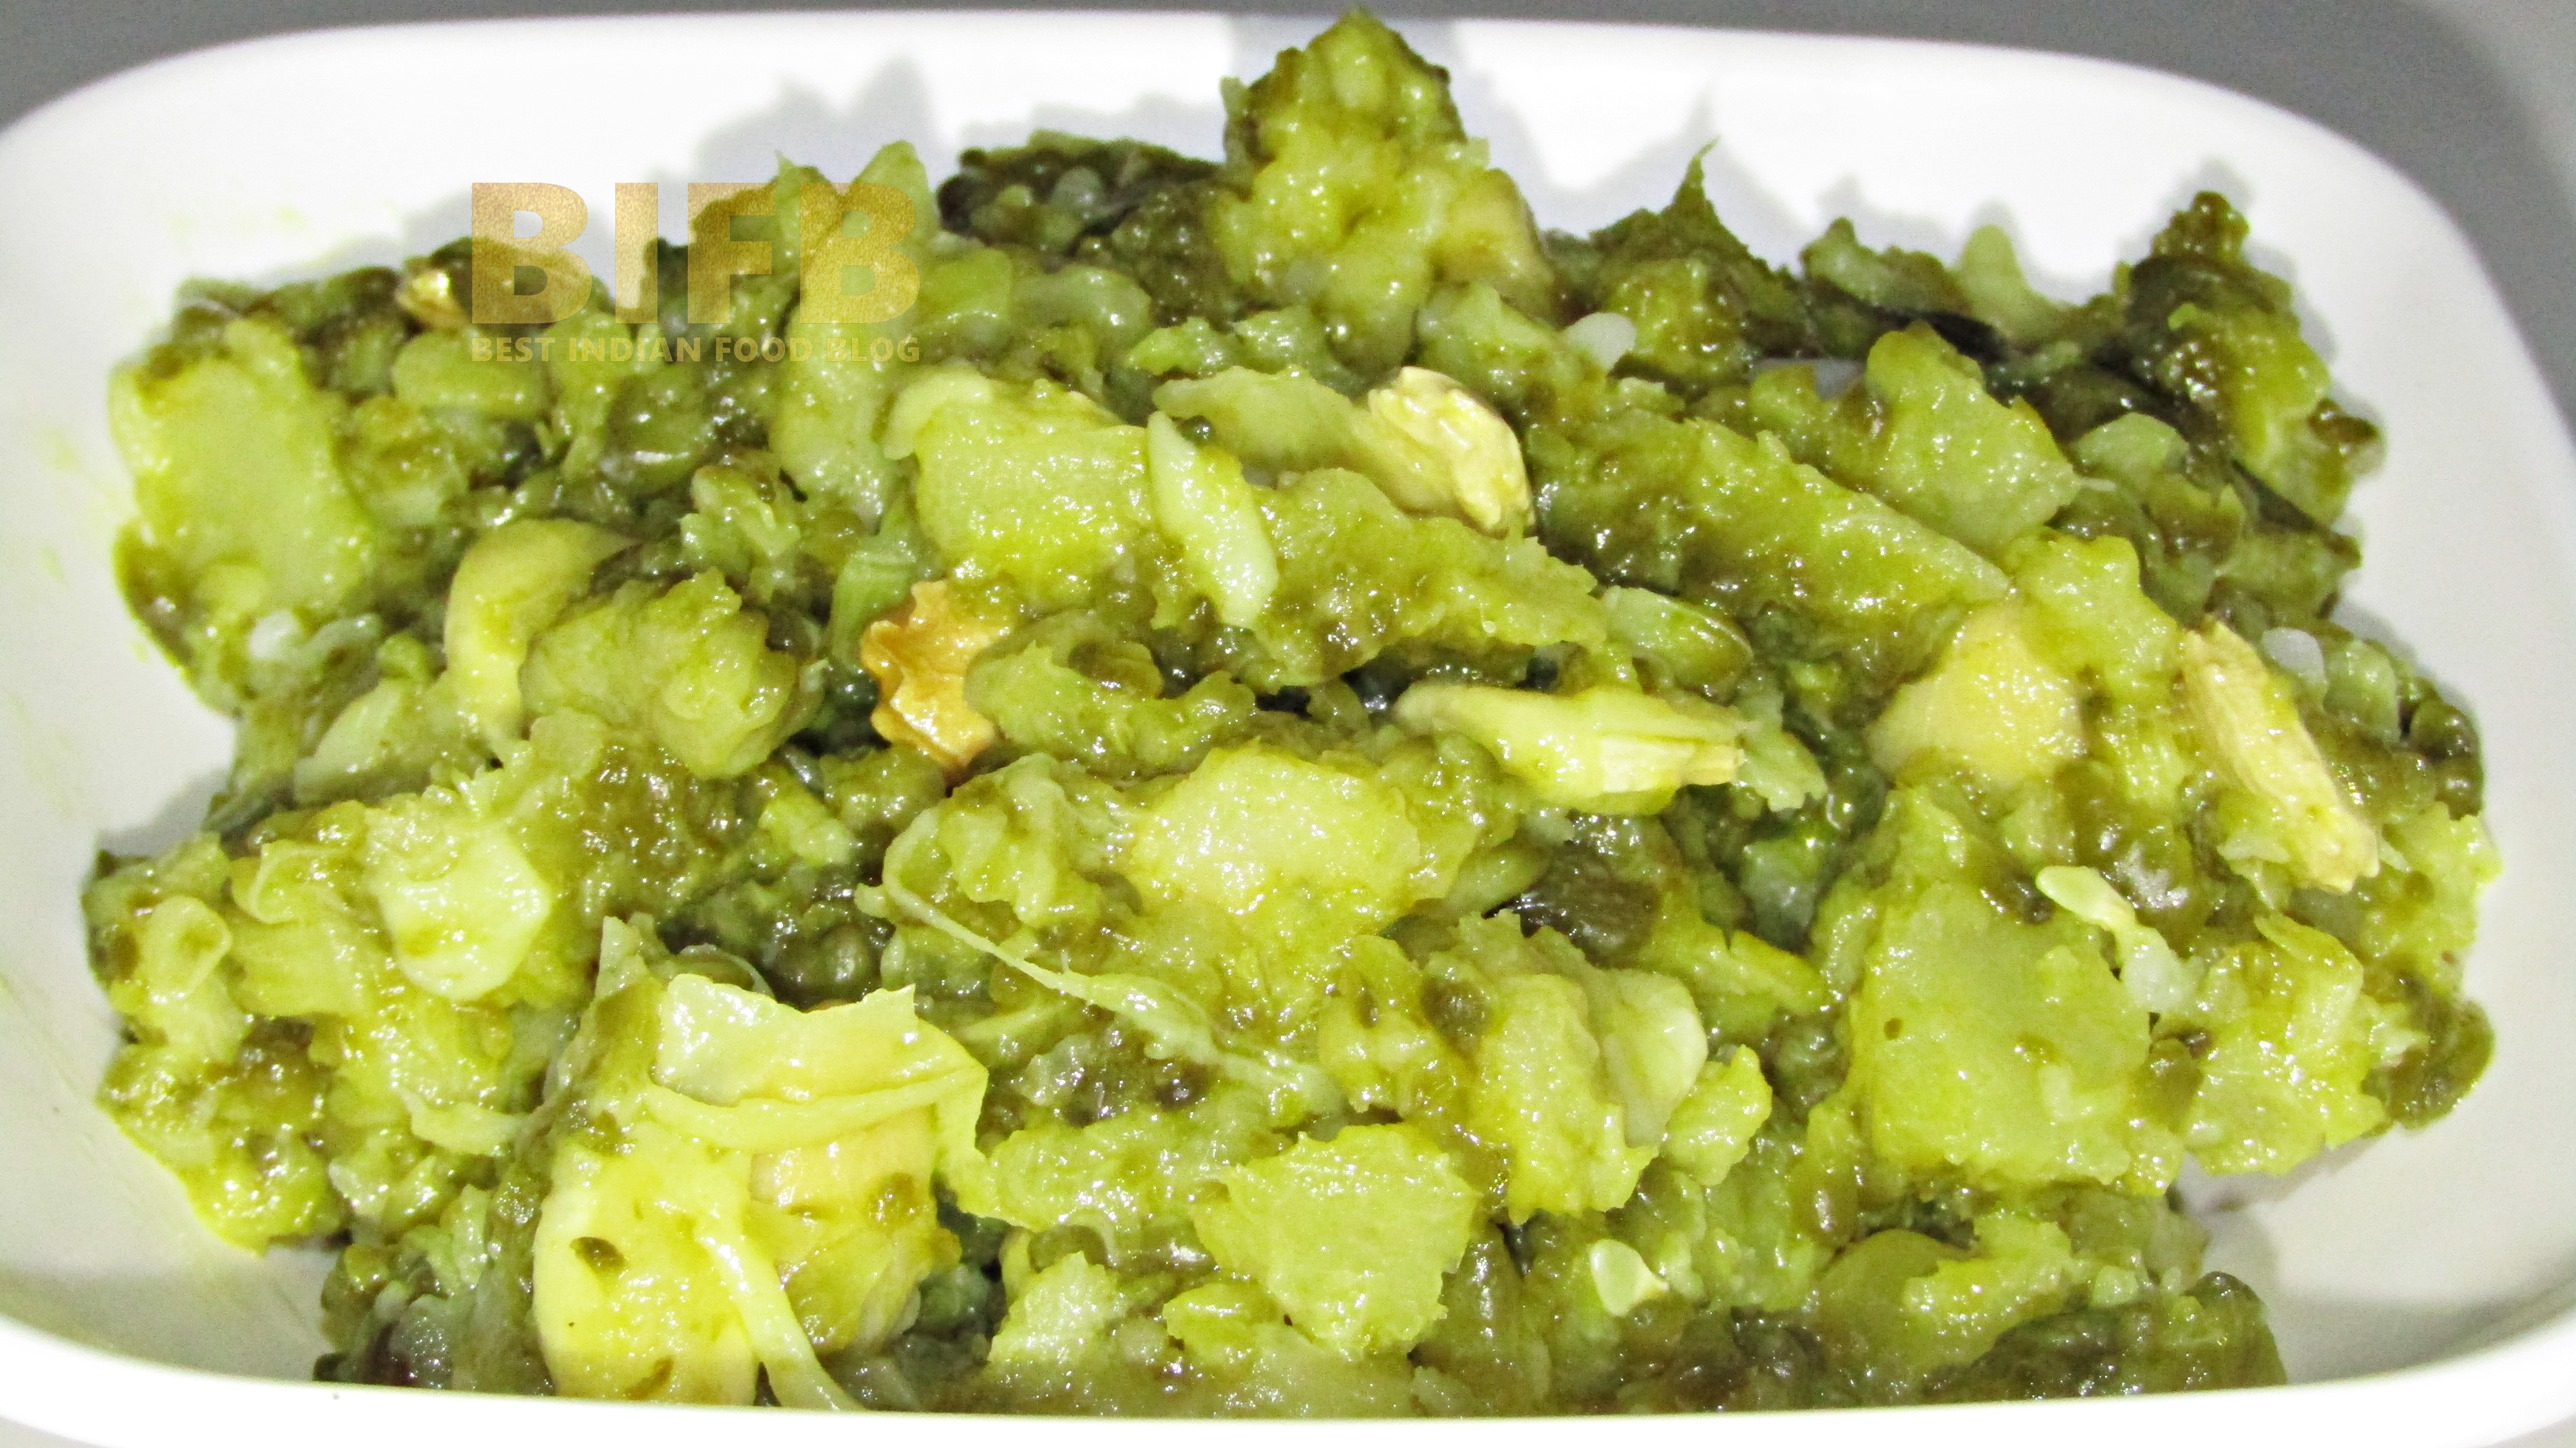 Karola Sedhho from West Bengal, India | Best Indian Food Blog | Bitter Melon recipe